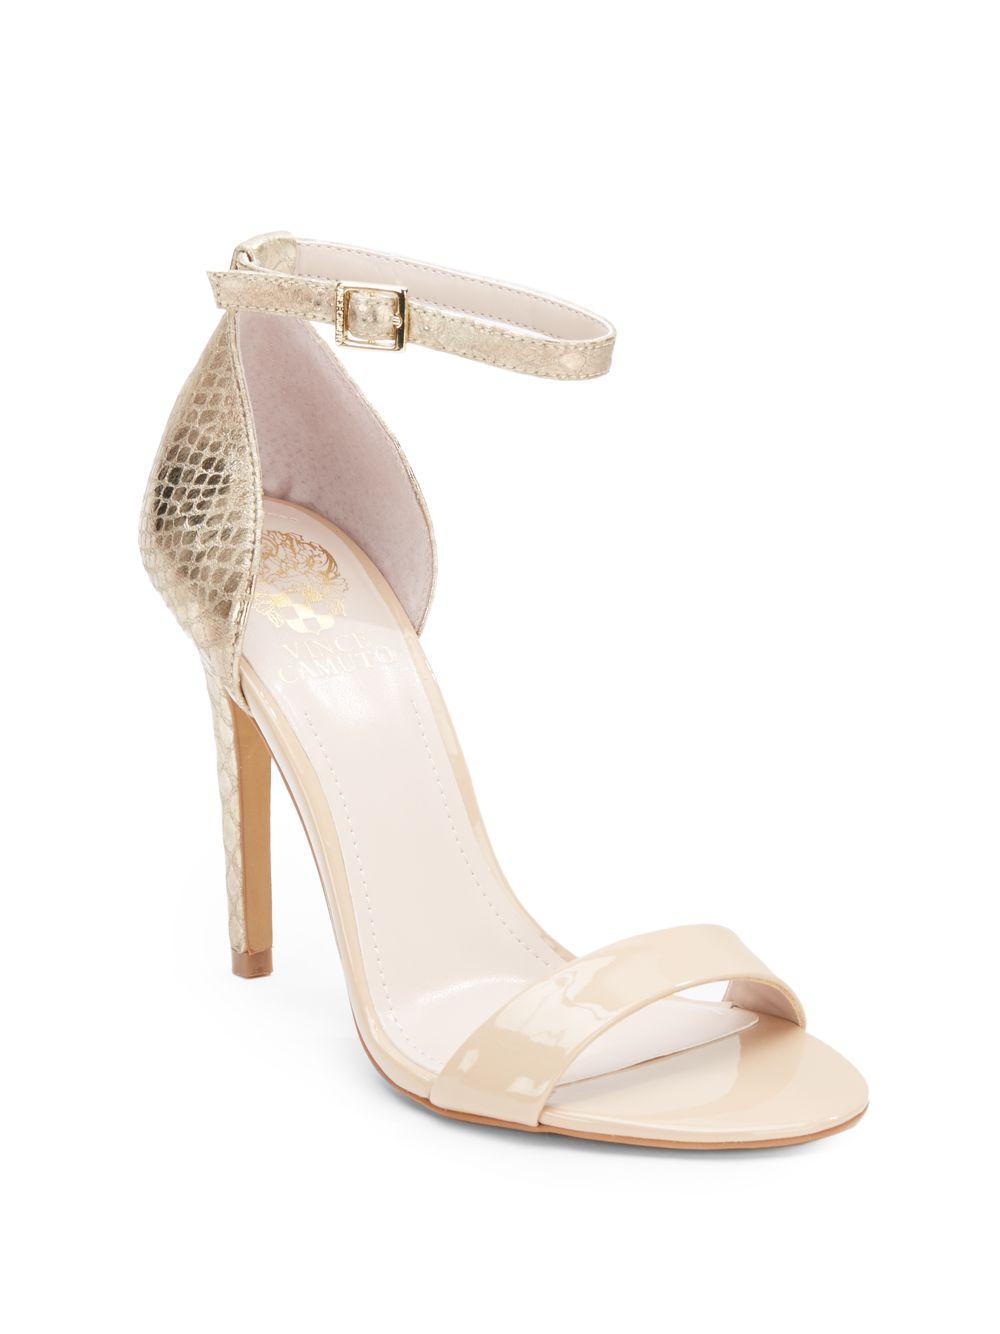 e09735f2008 Lyst - Vince Camuto Allison High-Heel Sandals in Metallic